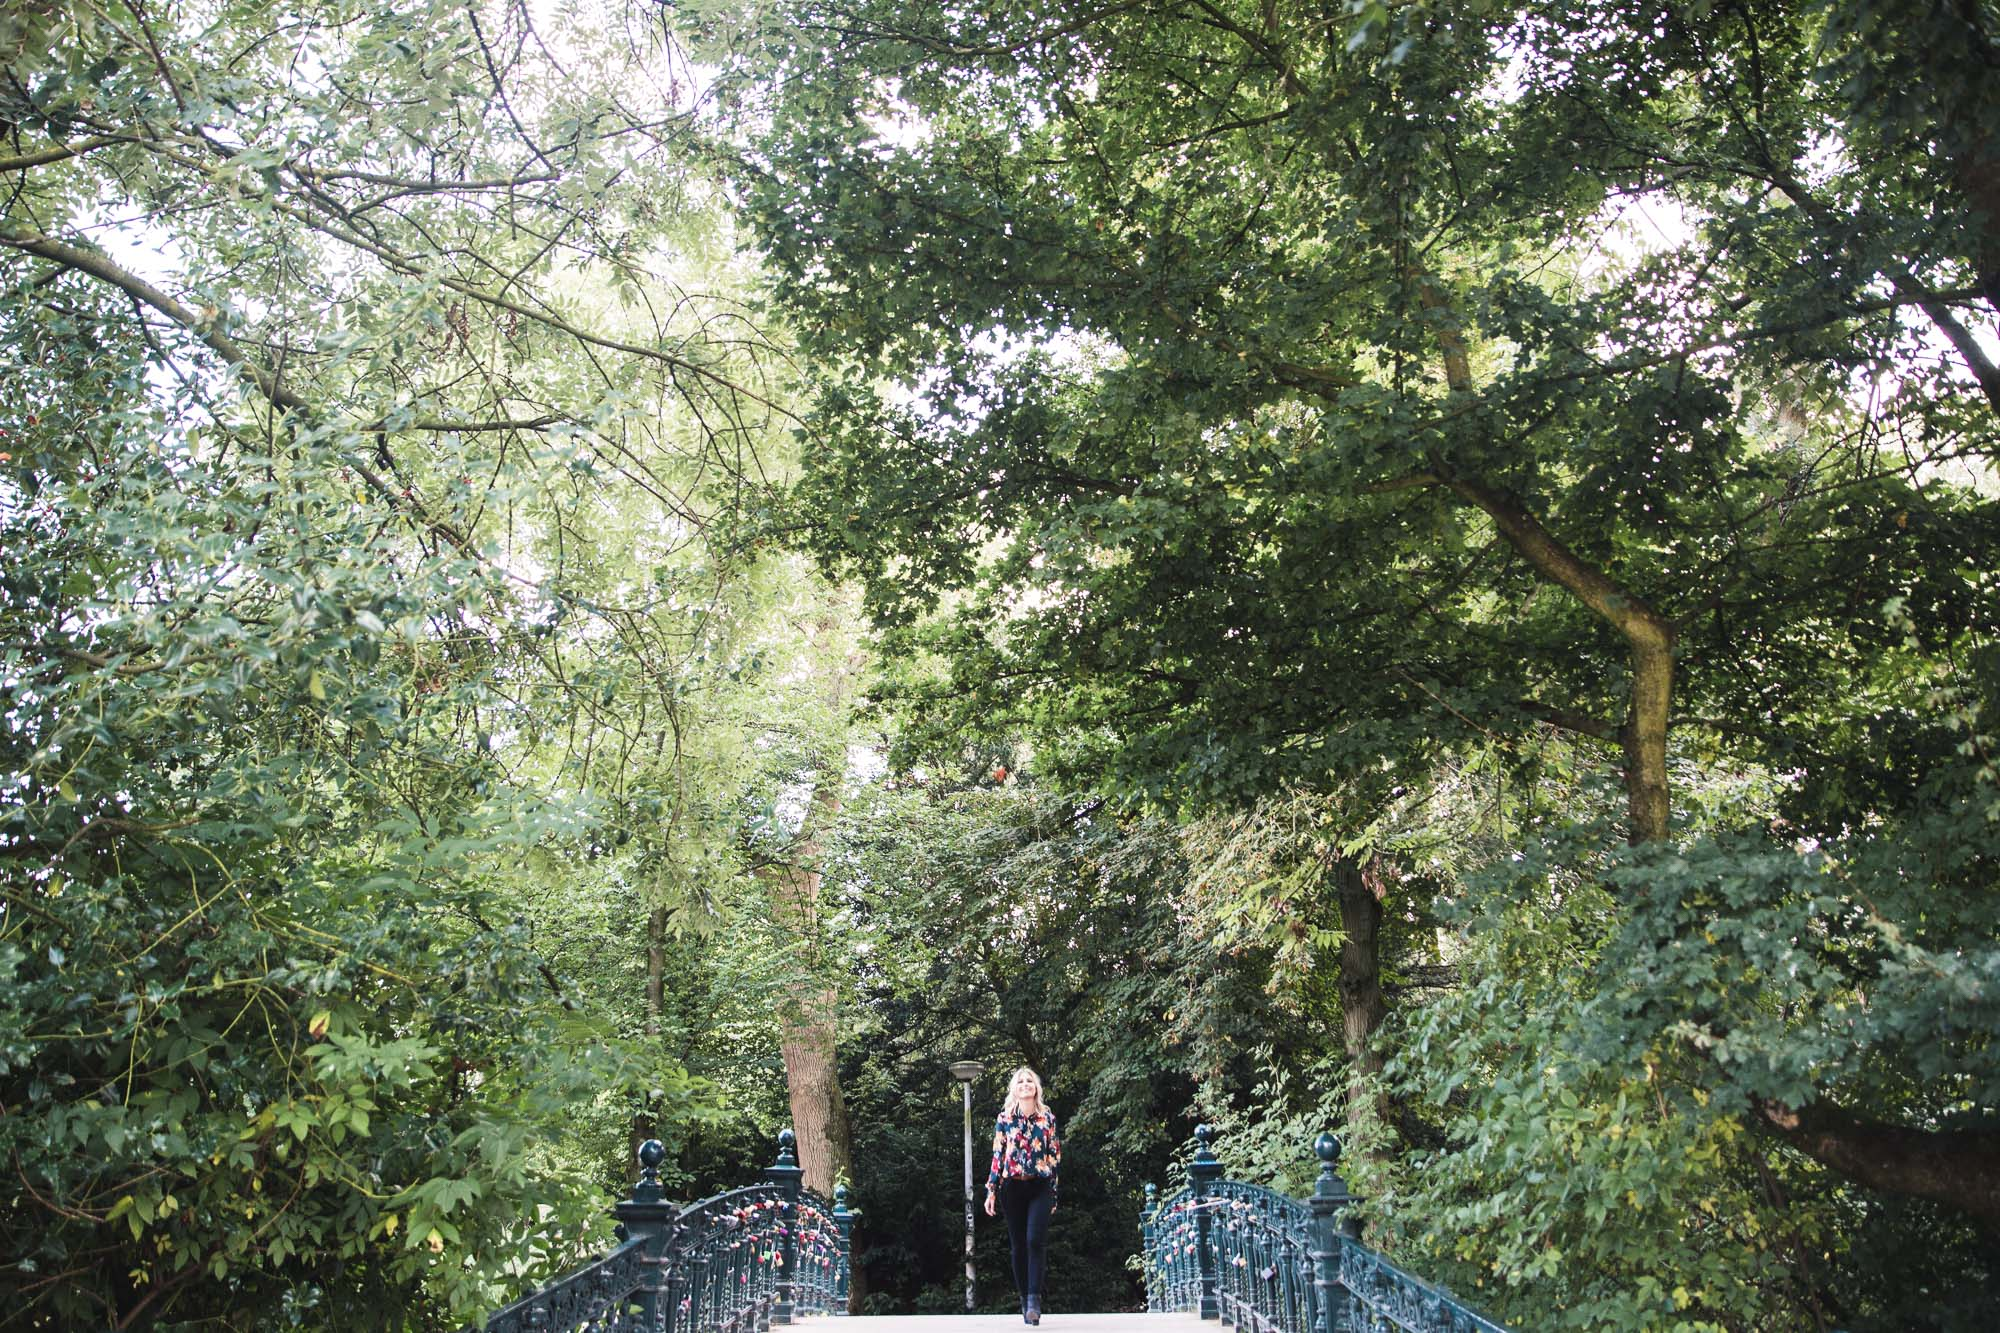 Vondelpark in the summer, walking across the many bridges in the center, Amsterdam, Netherlands